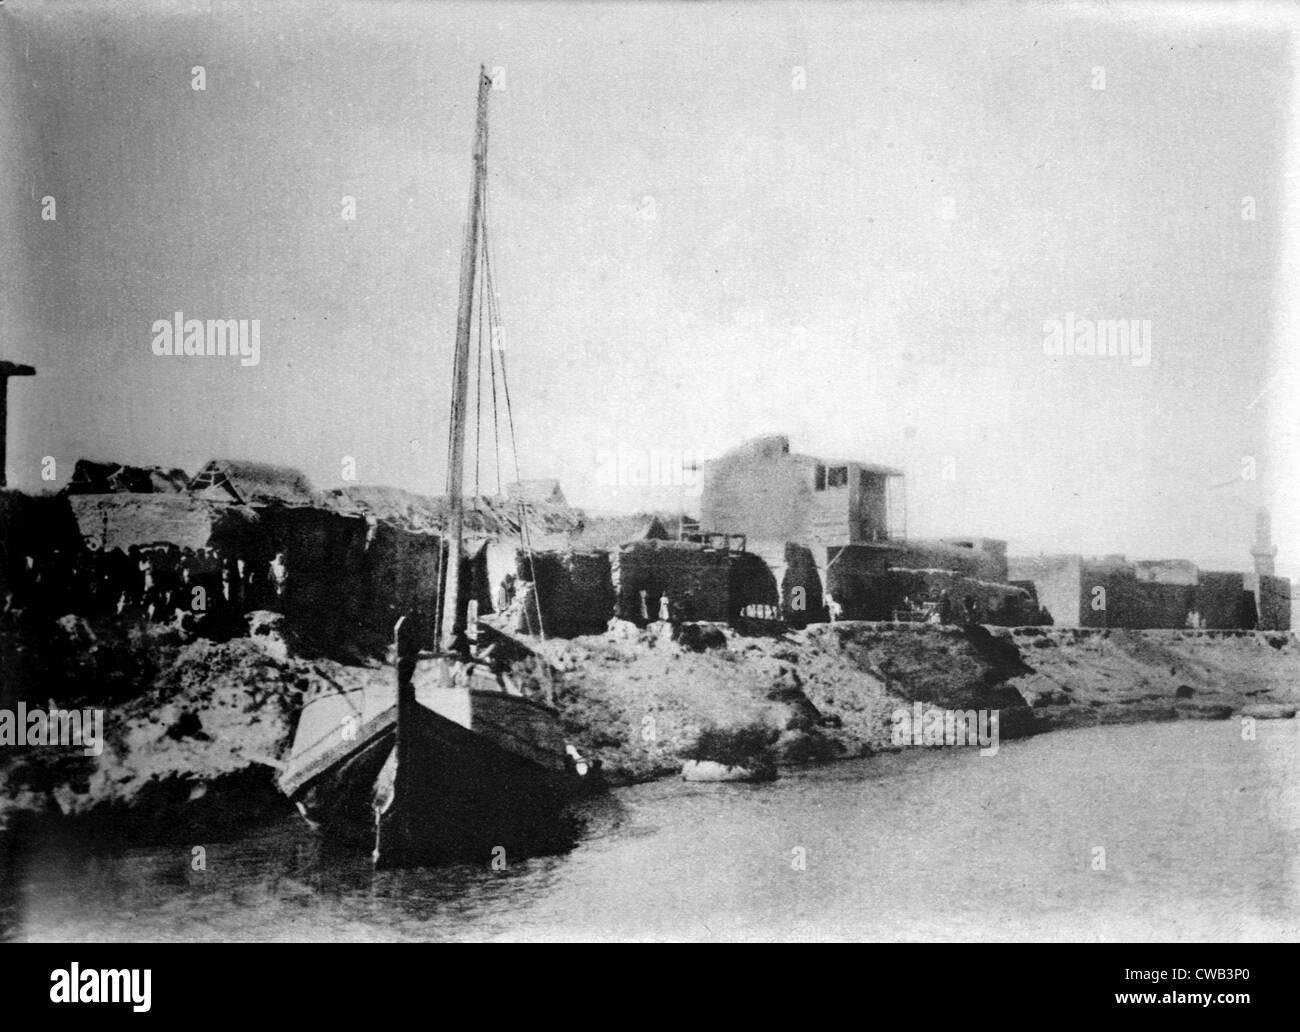 Iraq, A small sail boat anchored on the shore of the Tigris River near Kut-El-Amara, circa 1920s. - Stock Image